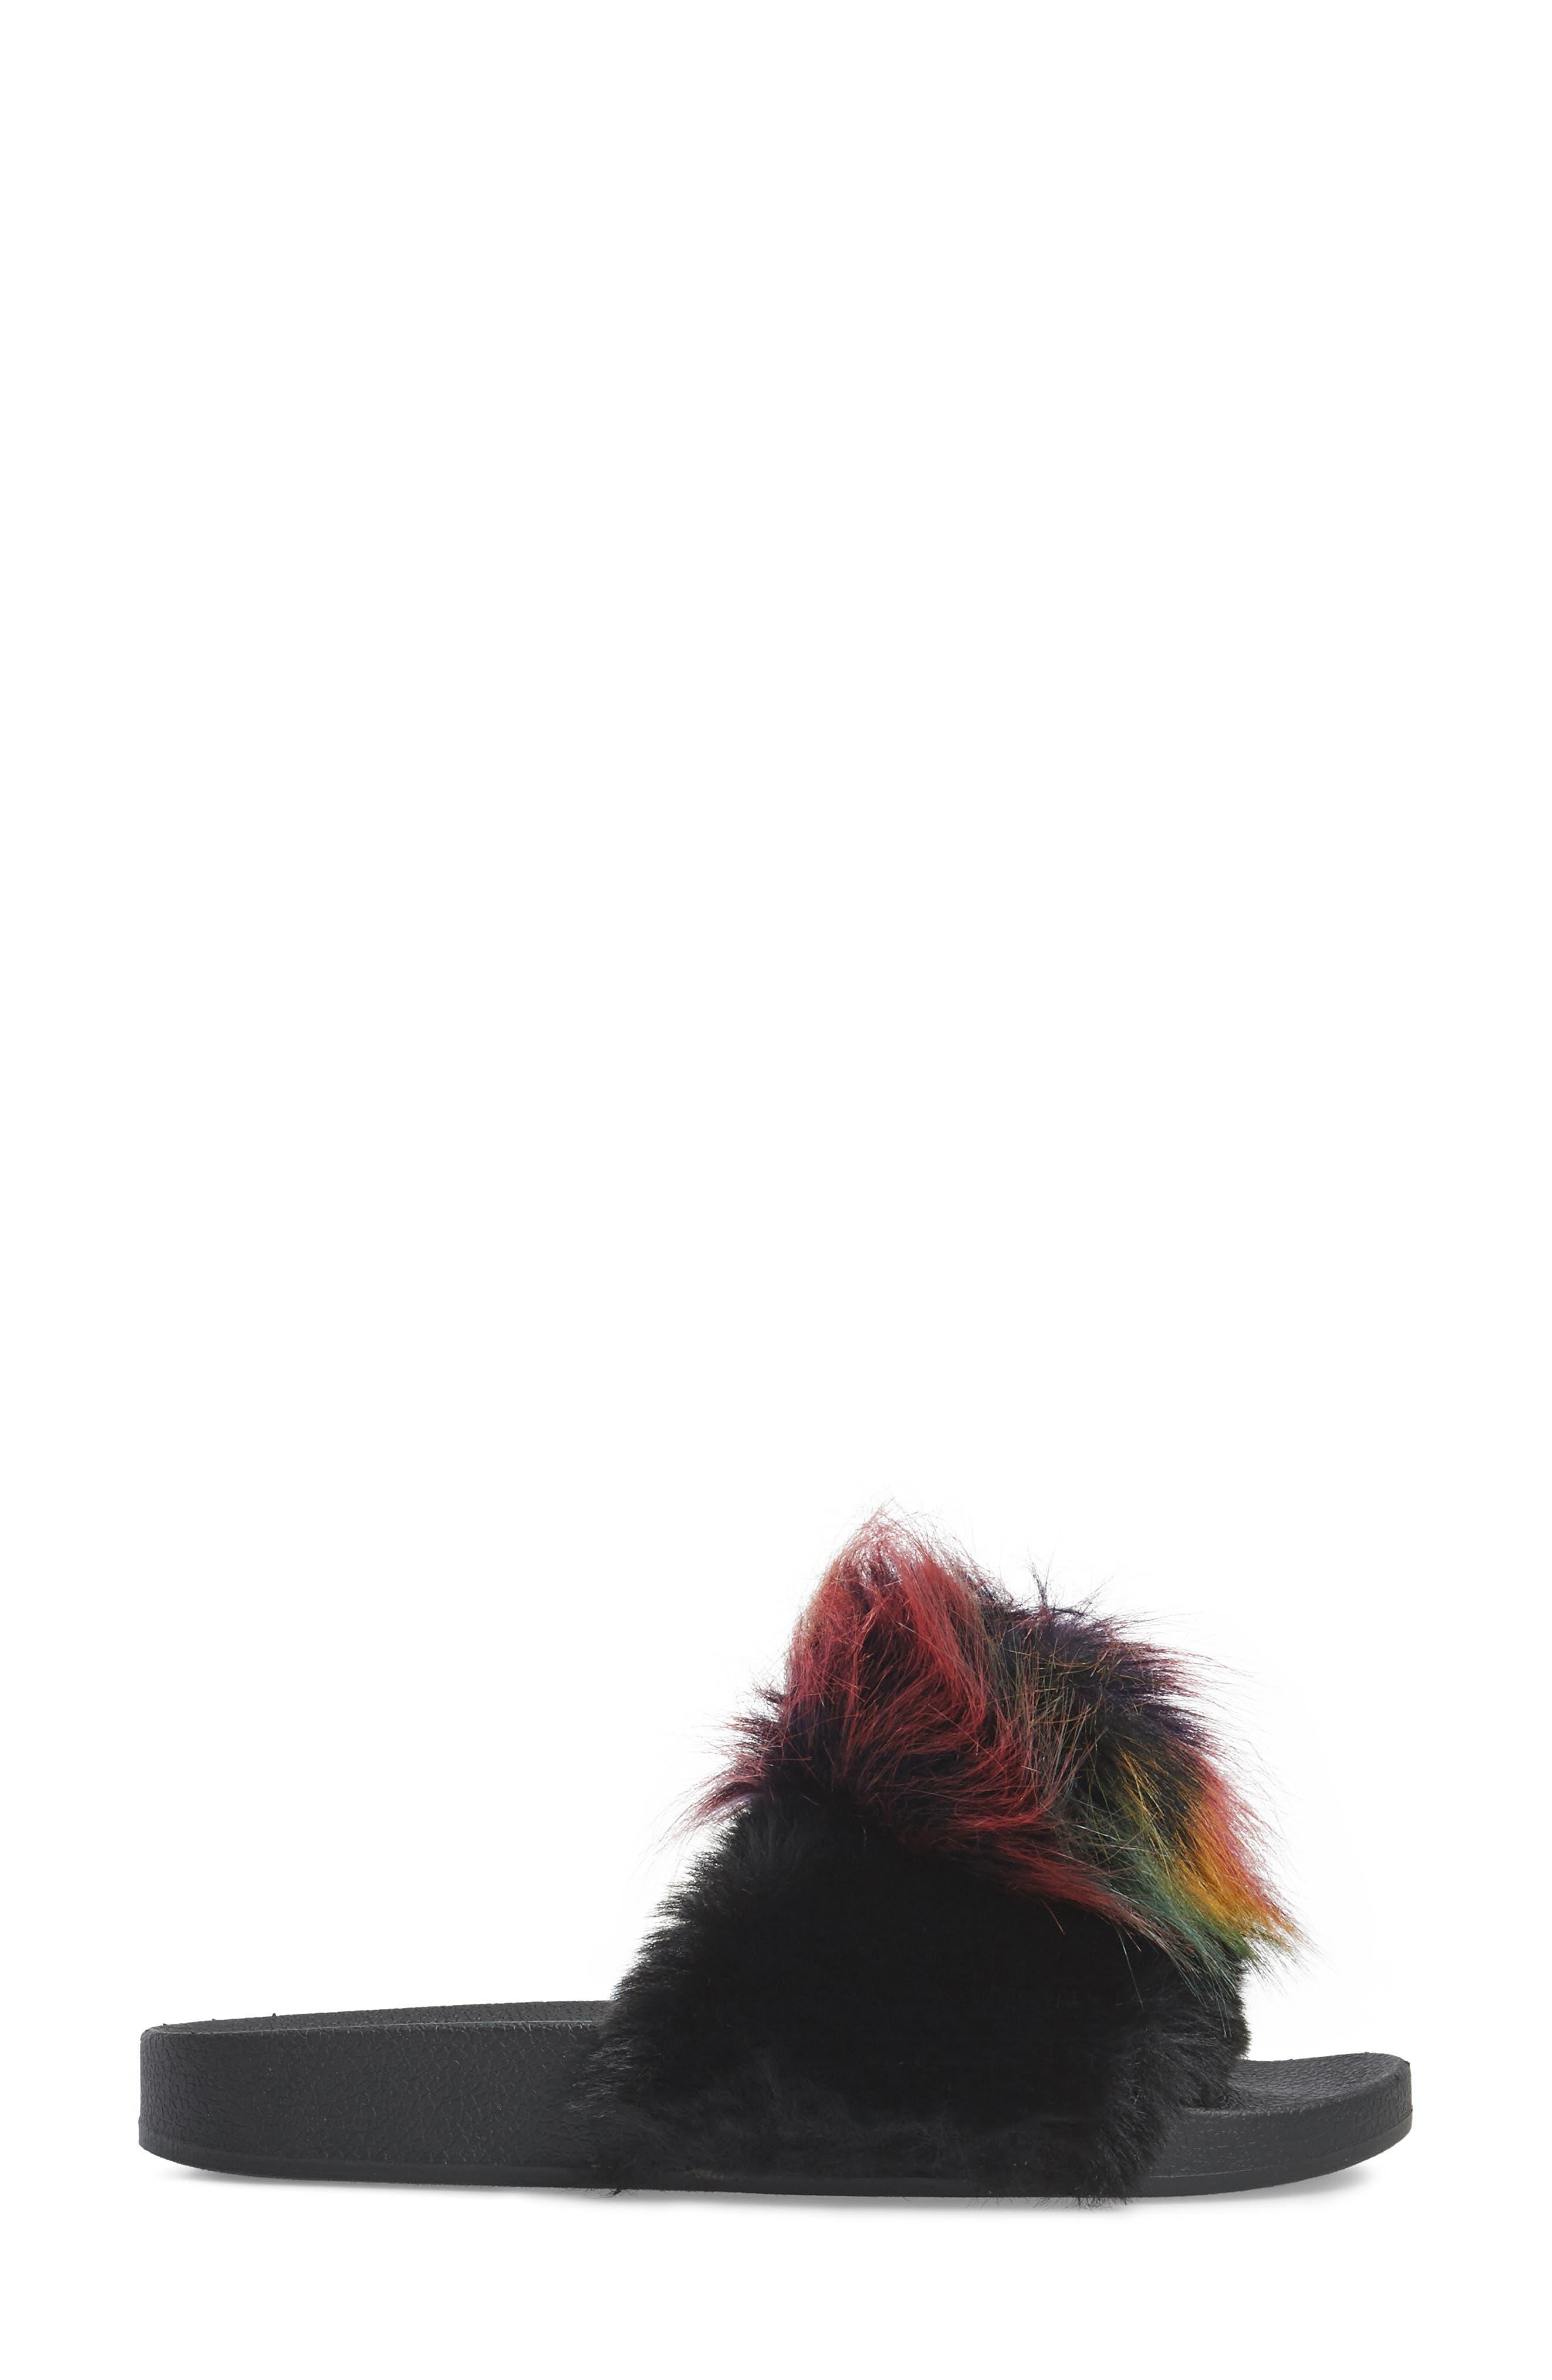 Spiral Faux Fur Slide Sandal,                             Alternate thumbnail 3, color,                             Black Multi